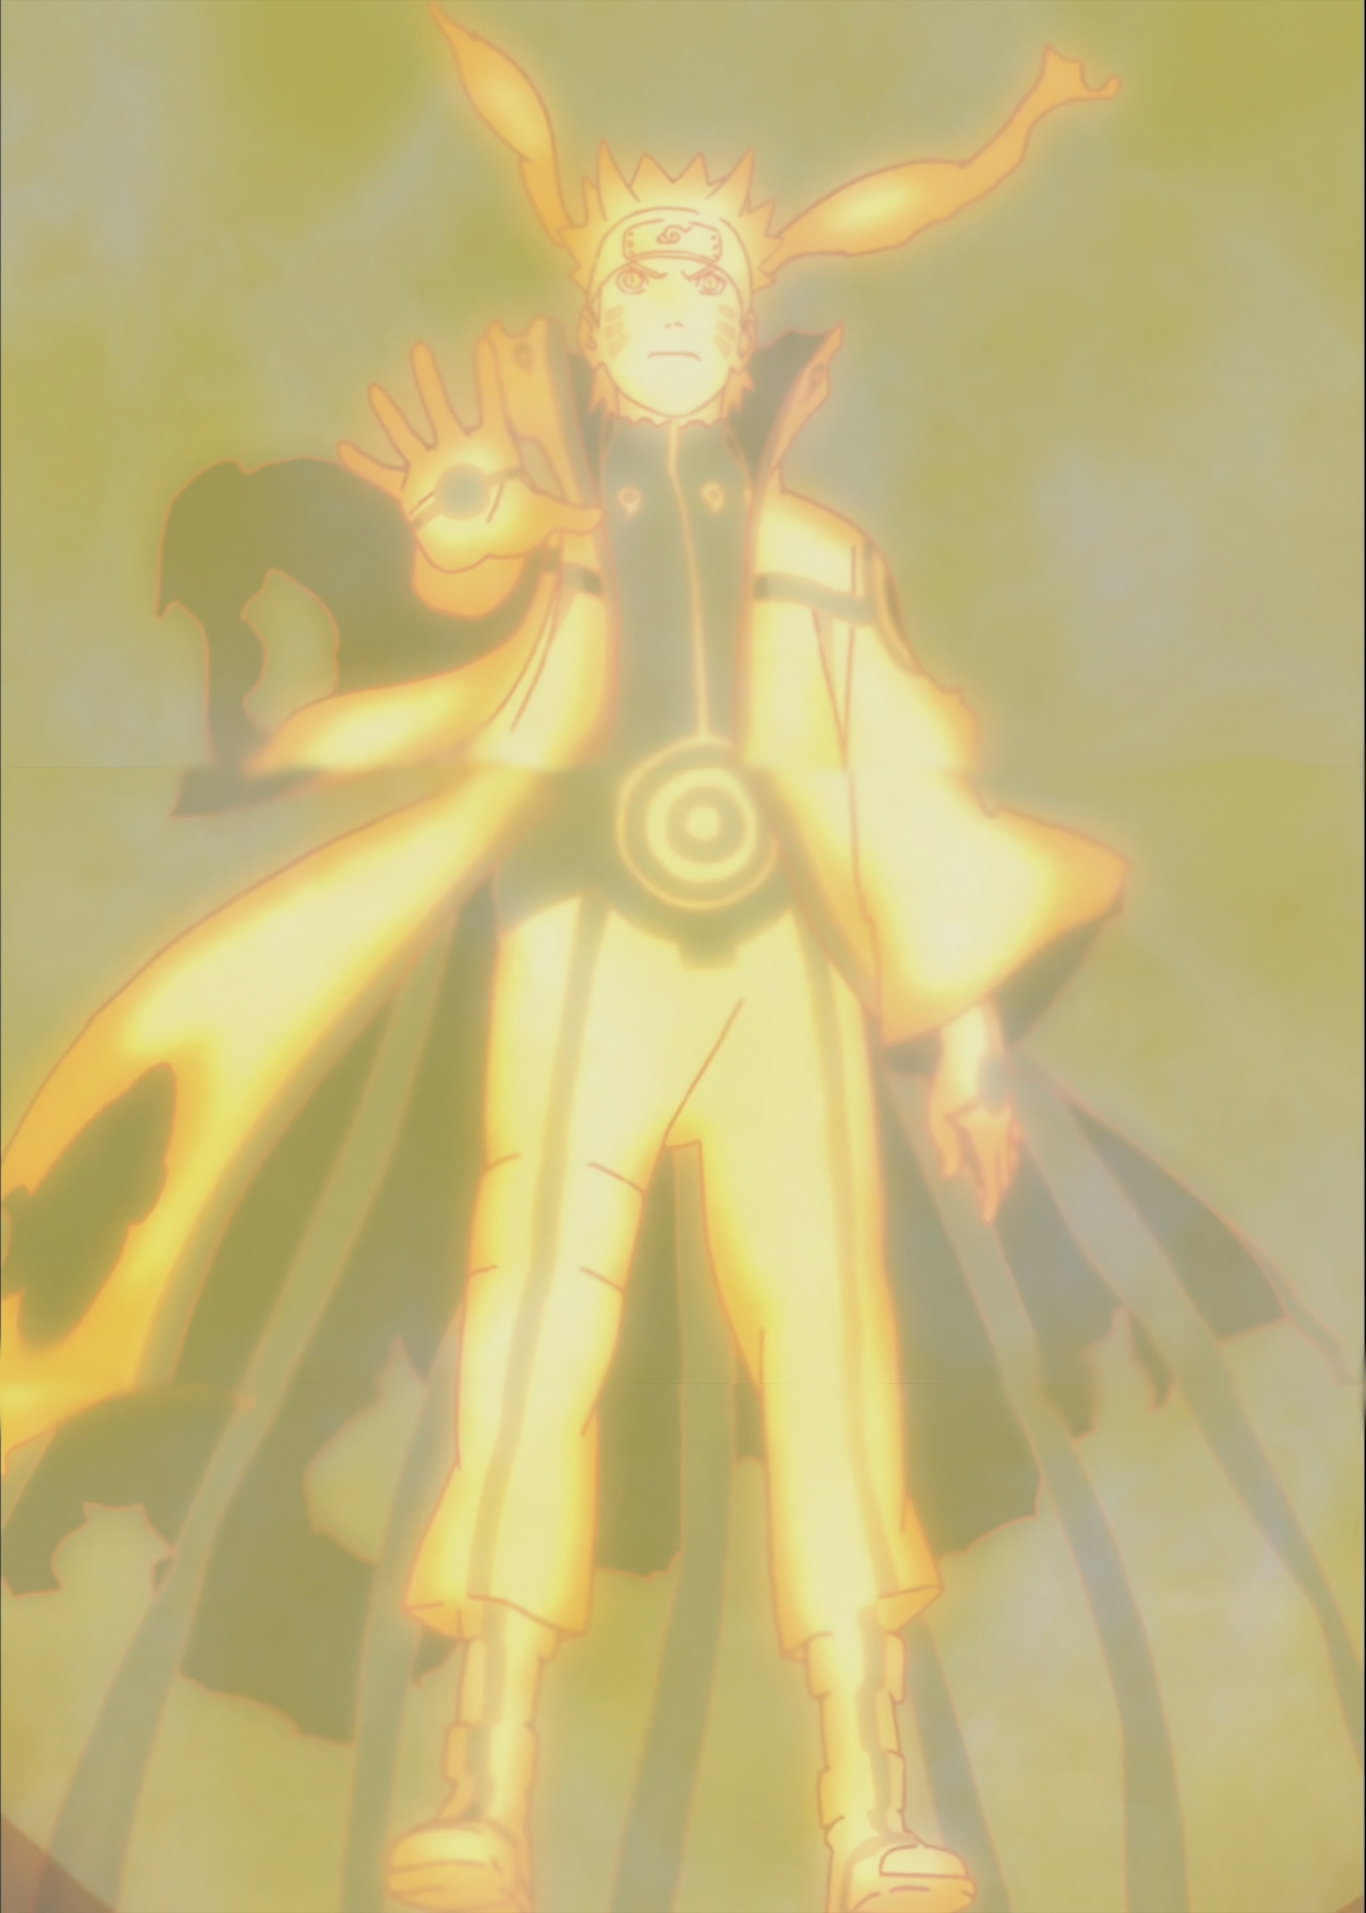 naruto bijuu mode anime daily anime art